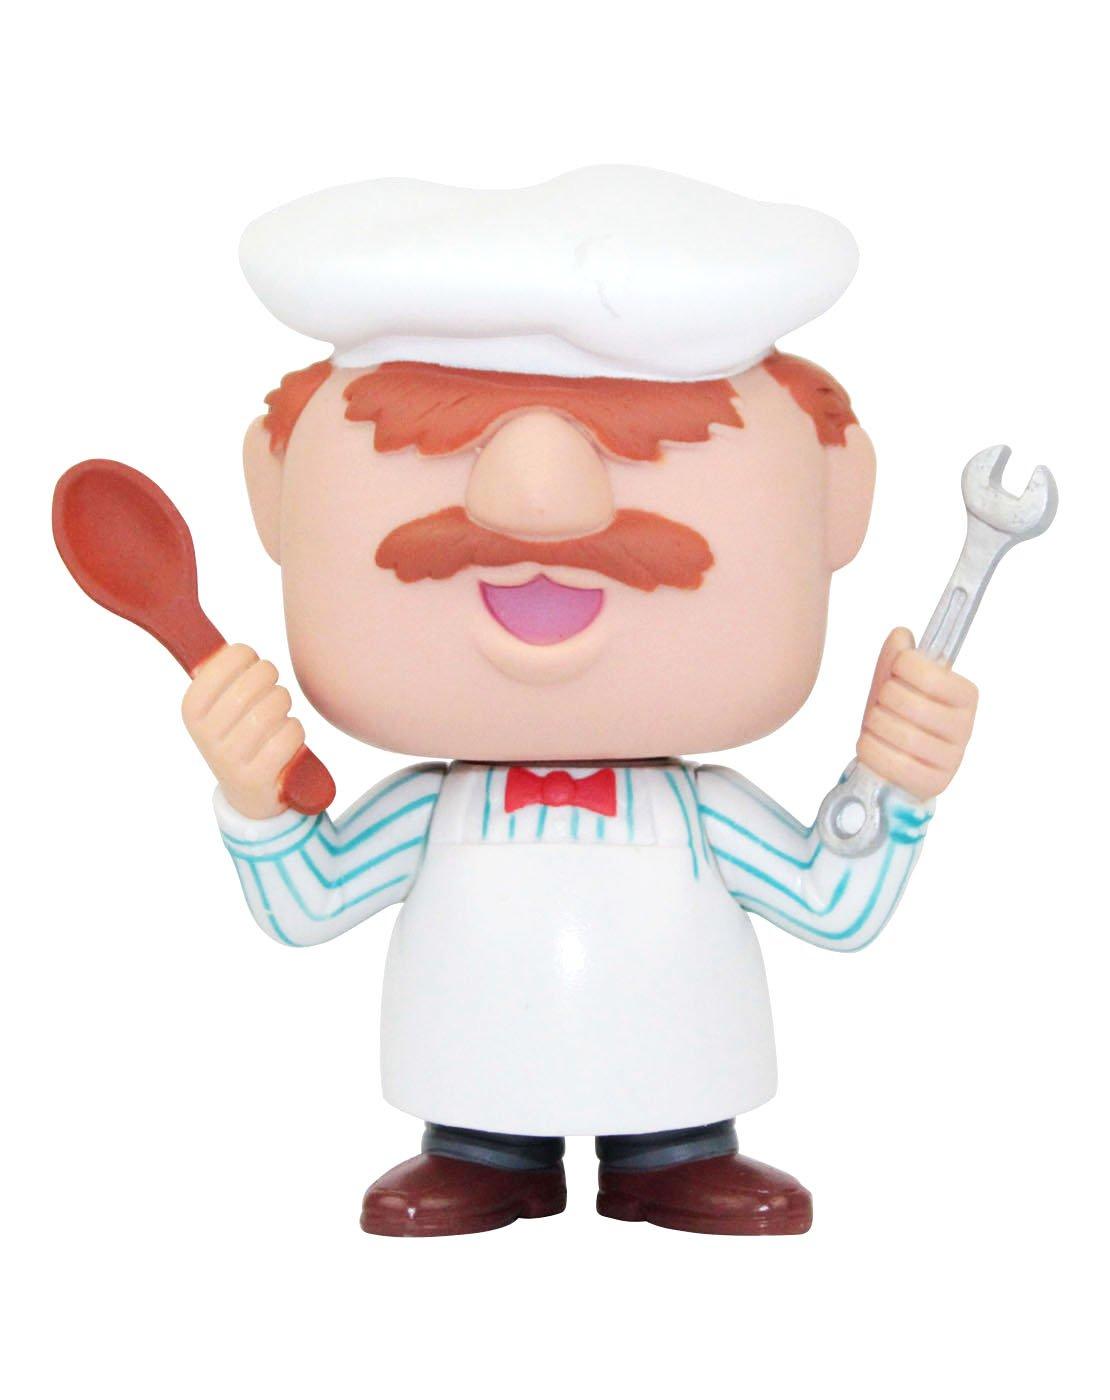 Funko Pop! Muppets Most Wanted Swedish Chef Vinyl-Figur